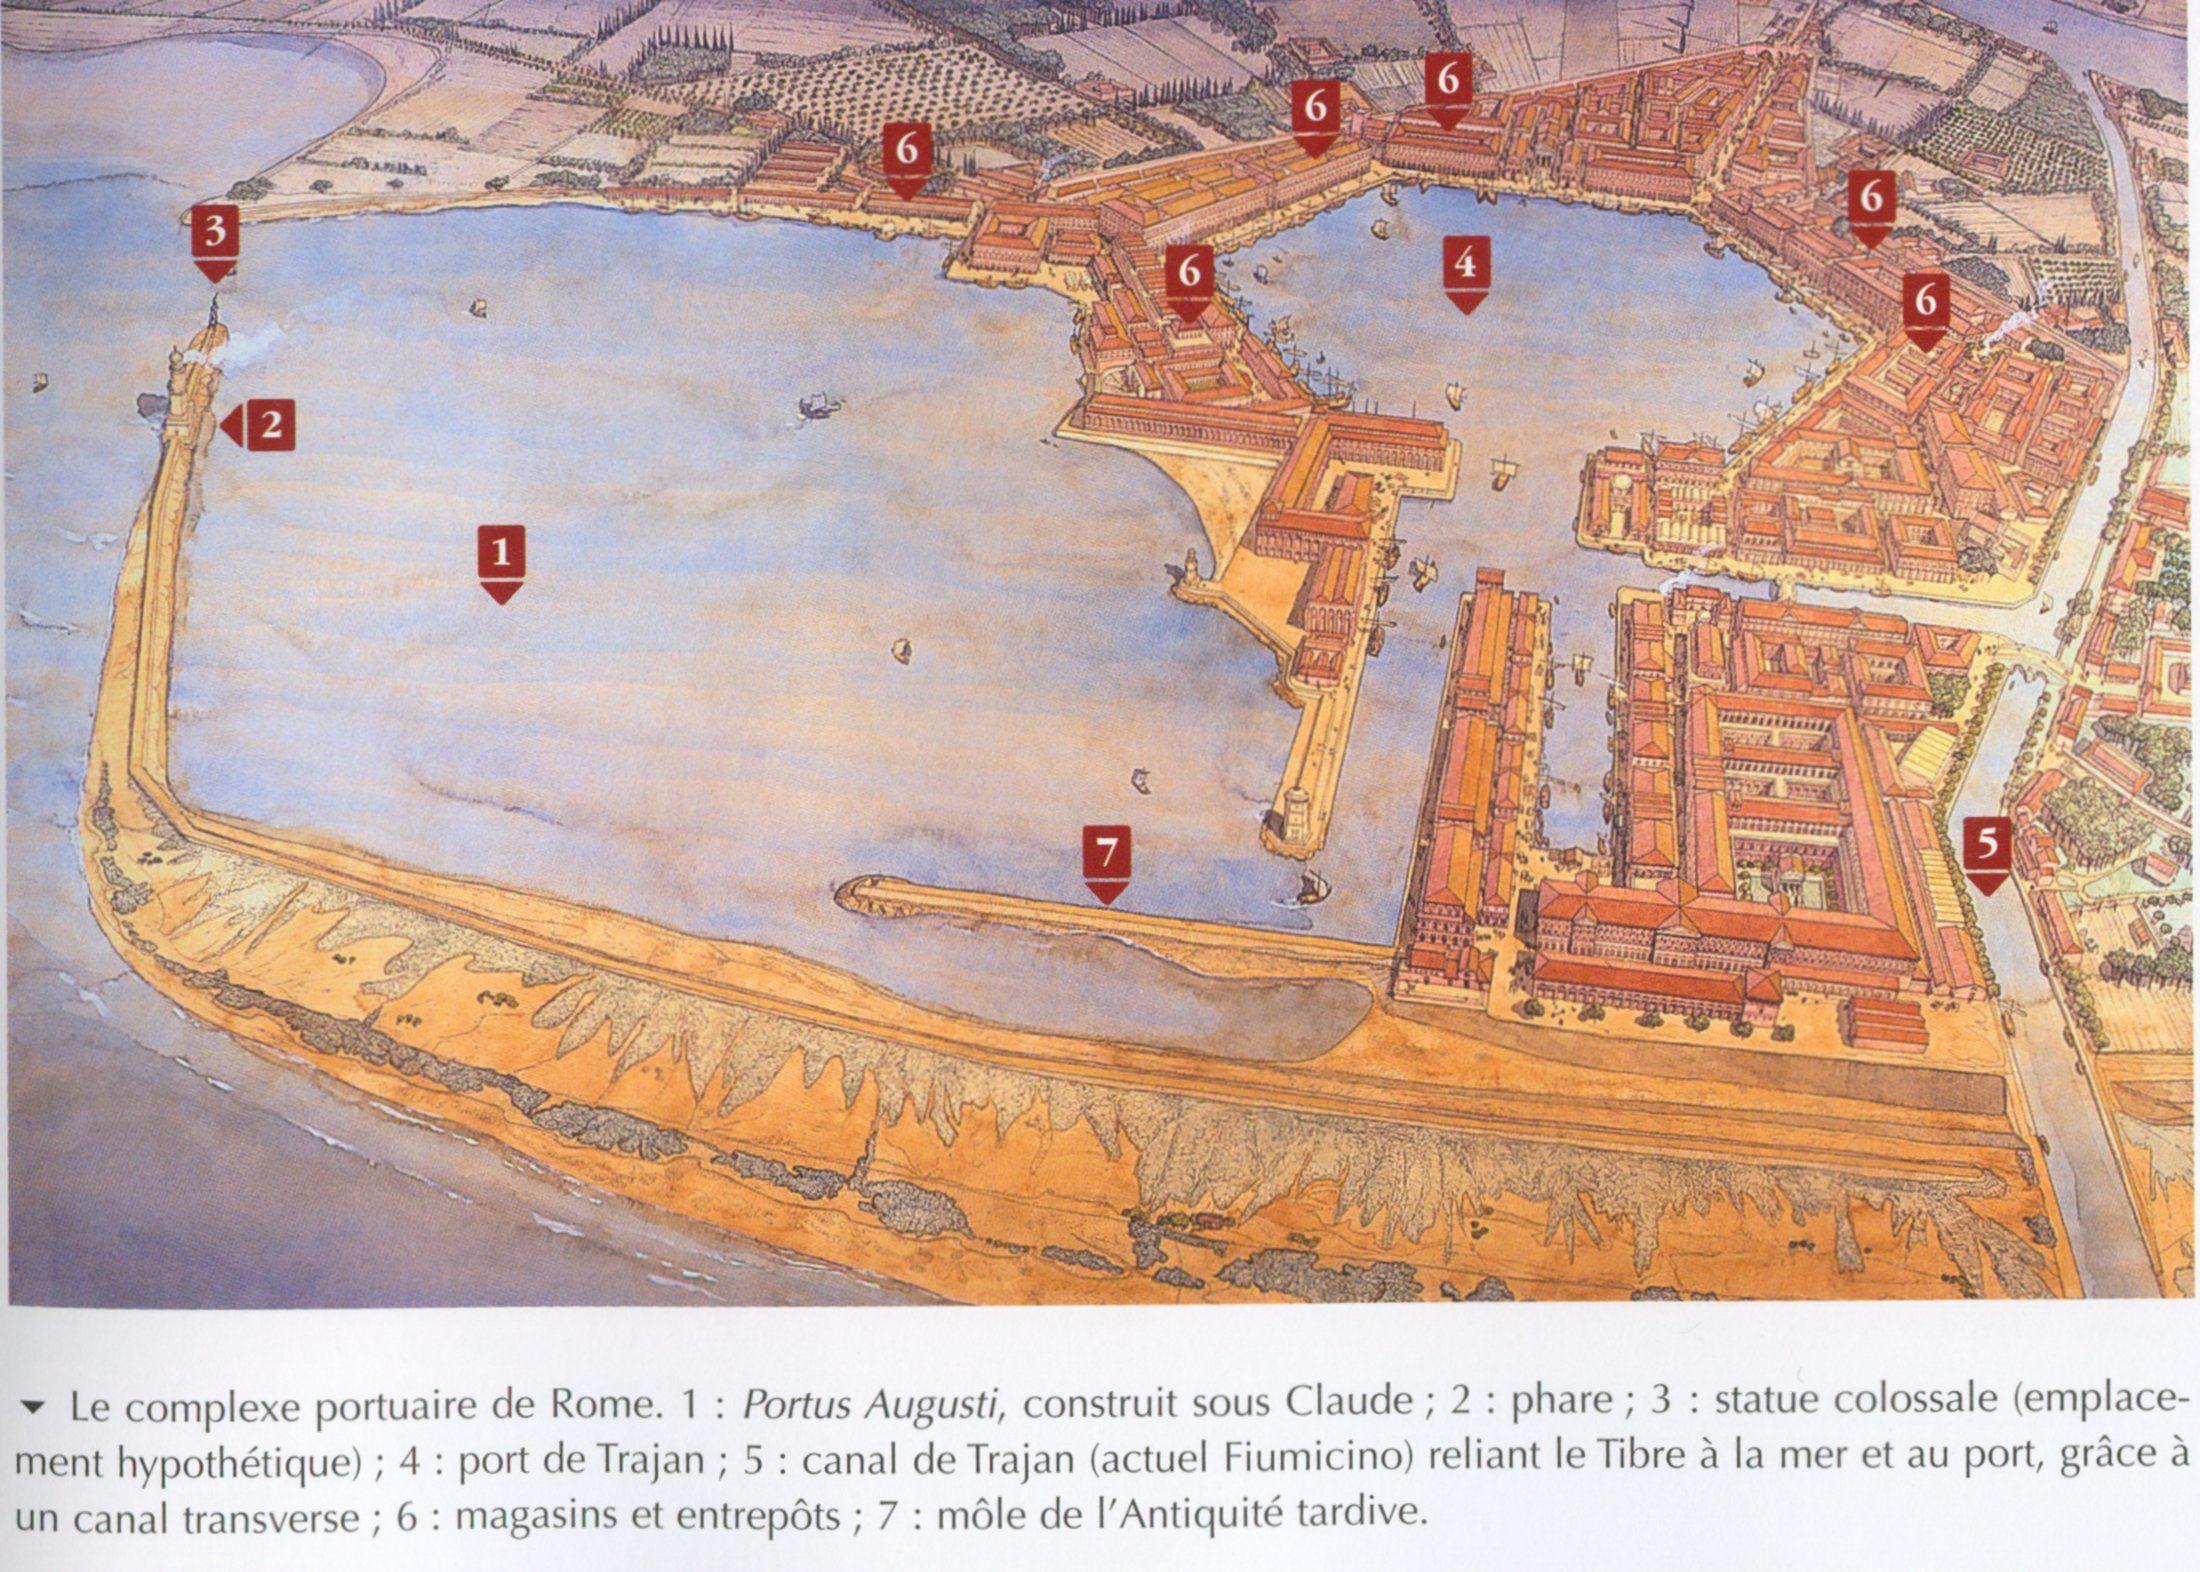 Portus with it's distinctive hexagonal harbor ~ Jean-Claude